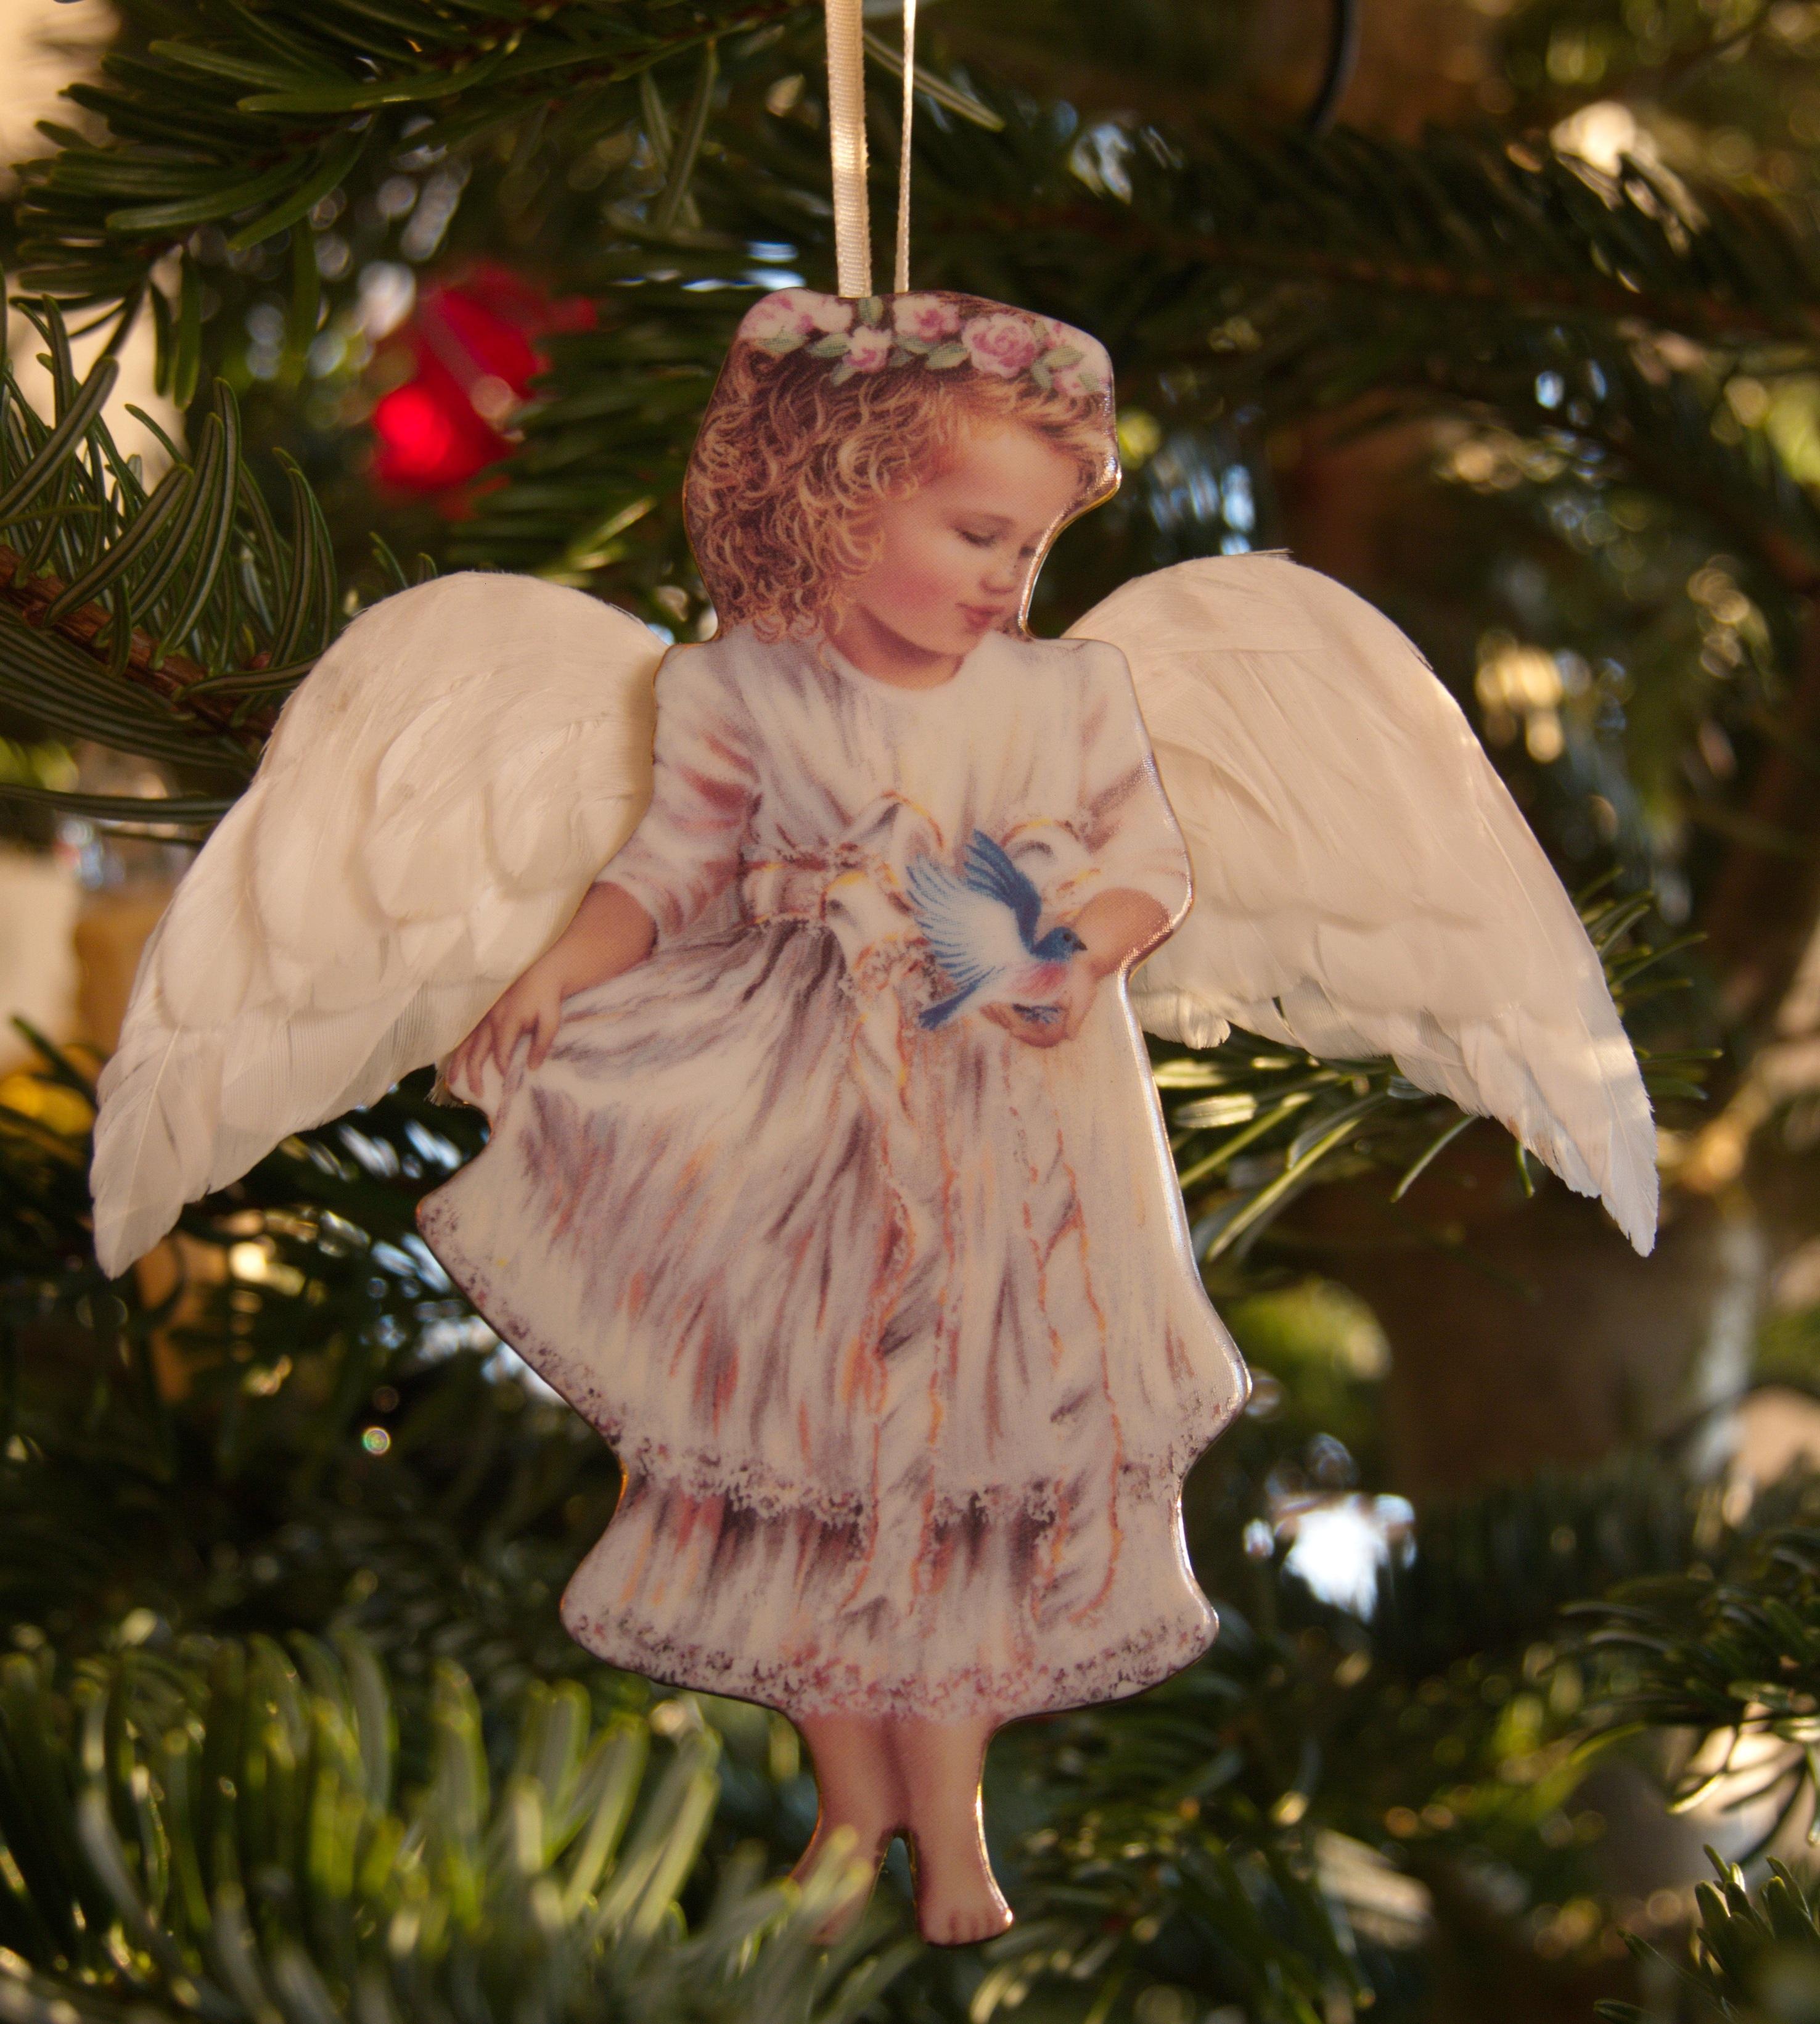 Cherub Christmas Decorations